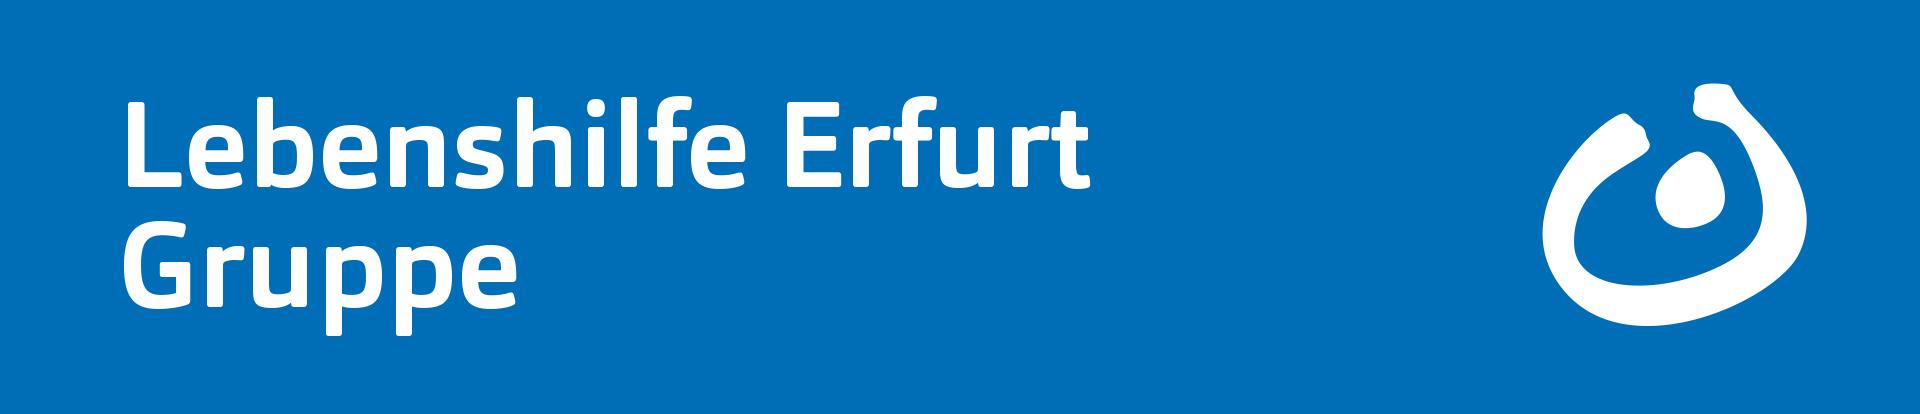 Logo der Lebenshilfe Erfurt Gruppe